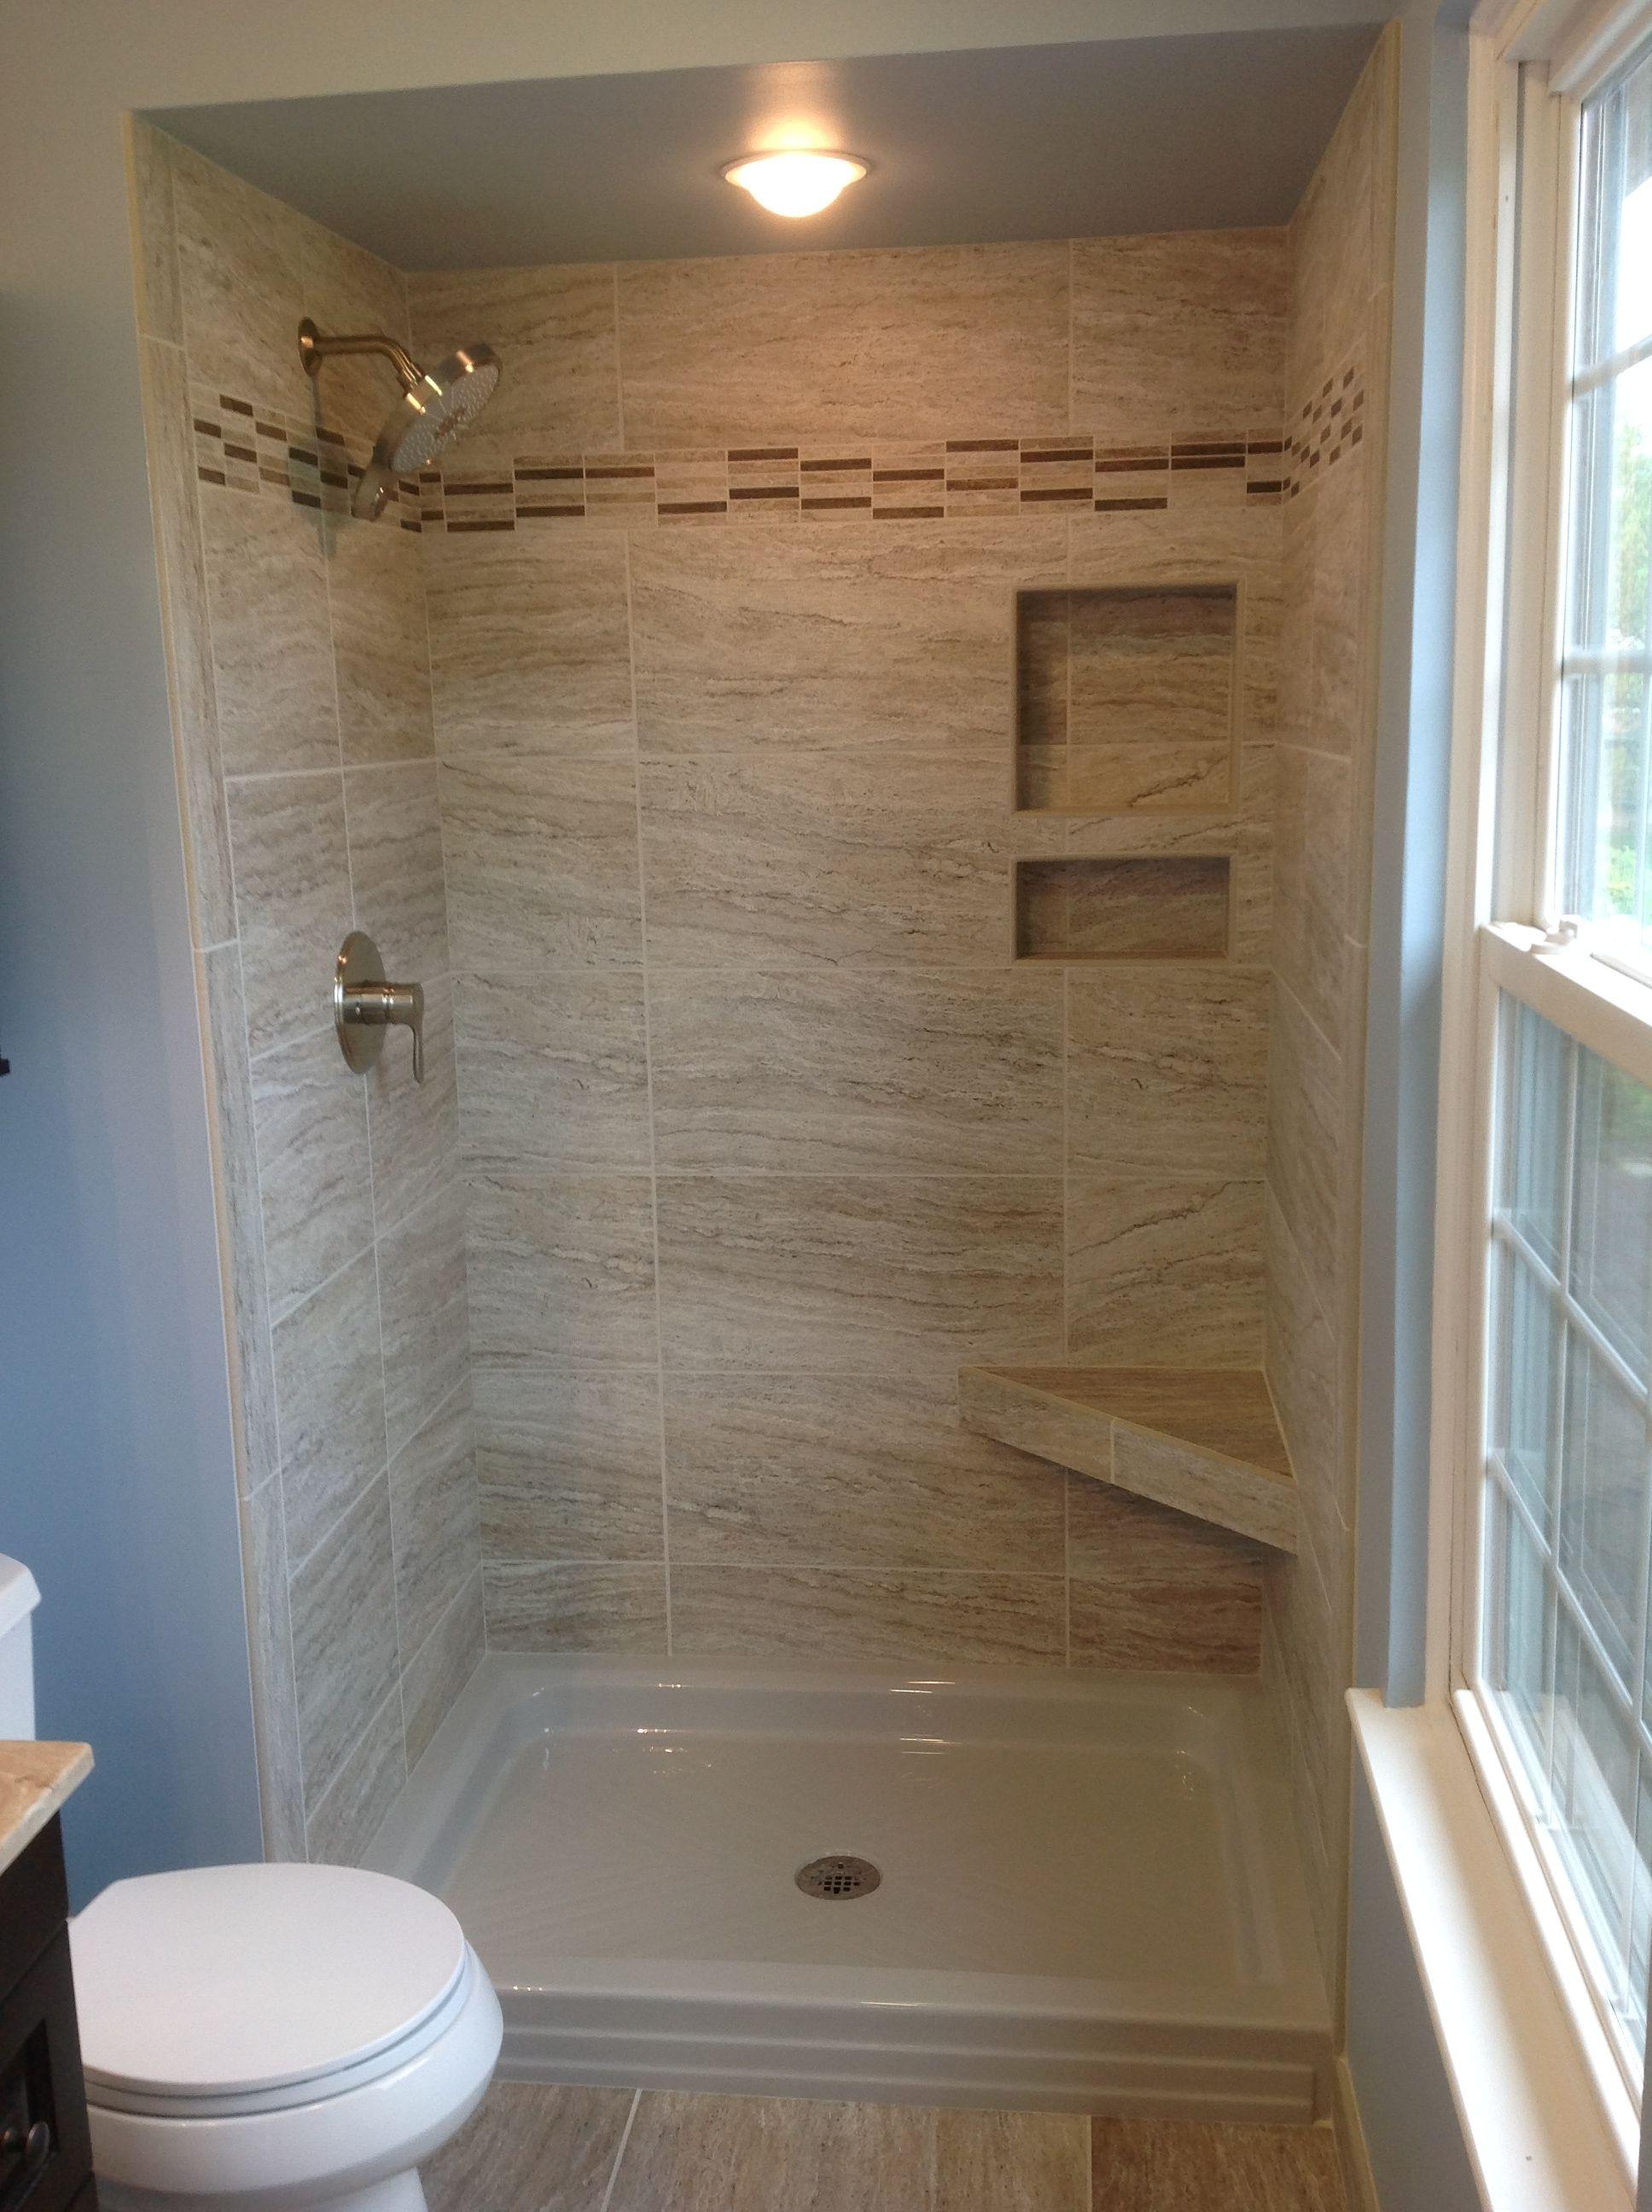 "Marazzi Silk Elegant 12x24"" tiles in a 34x48"" shower space ..."